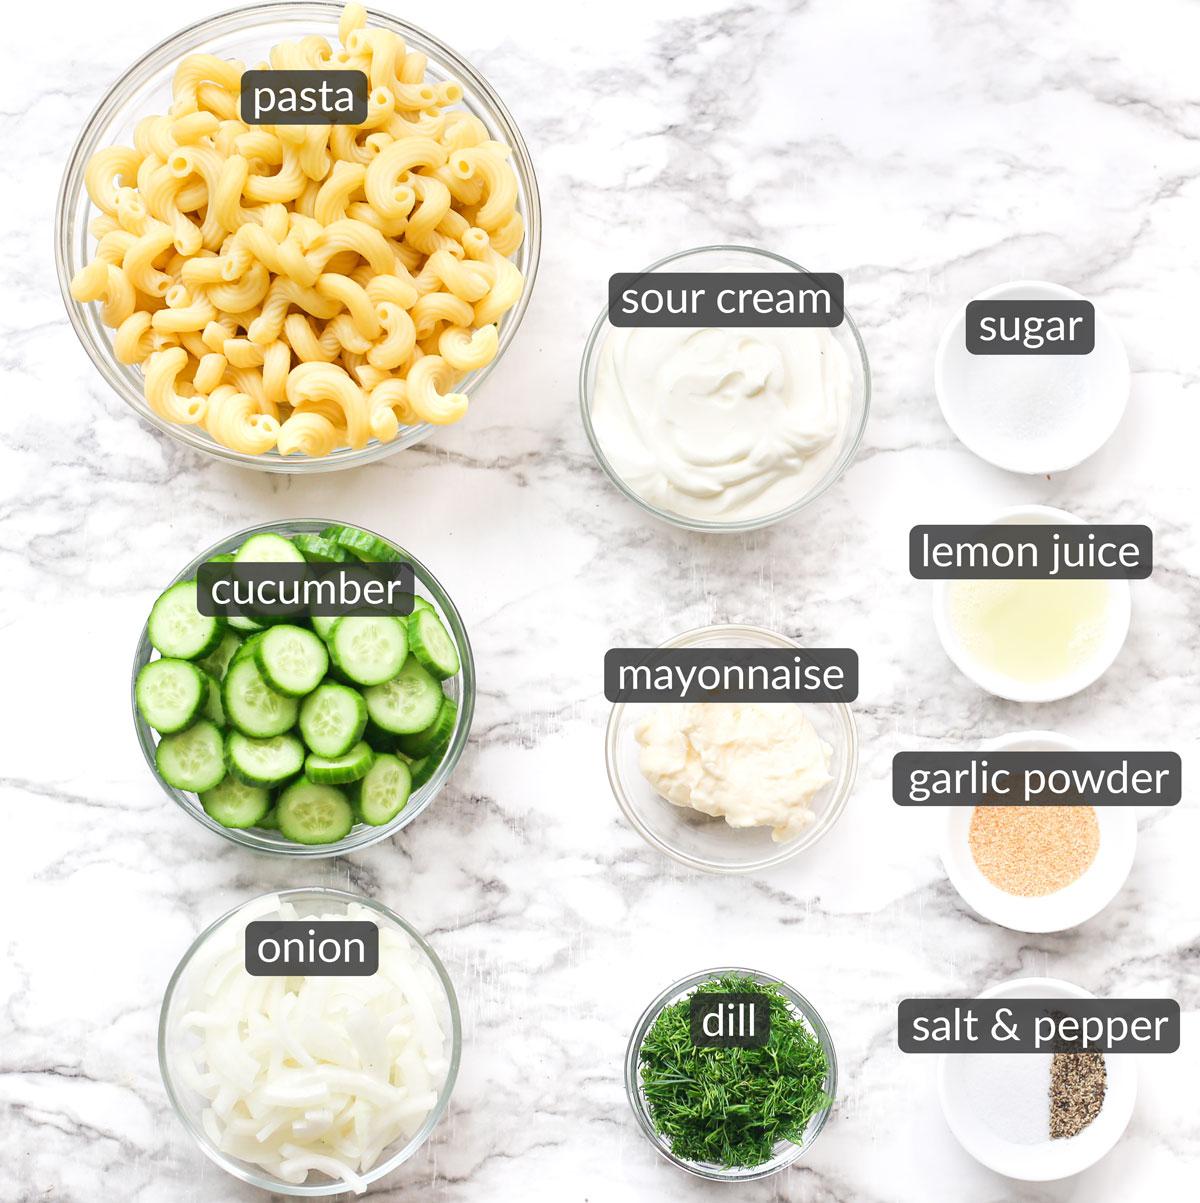 ingredients used to make creamy cucumber pasta salad